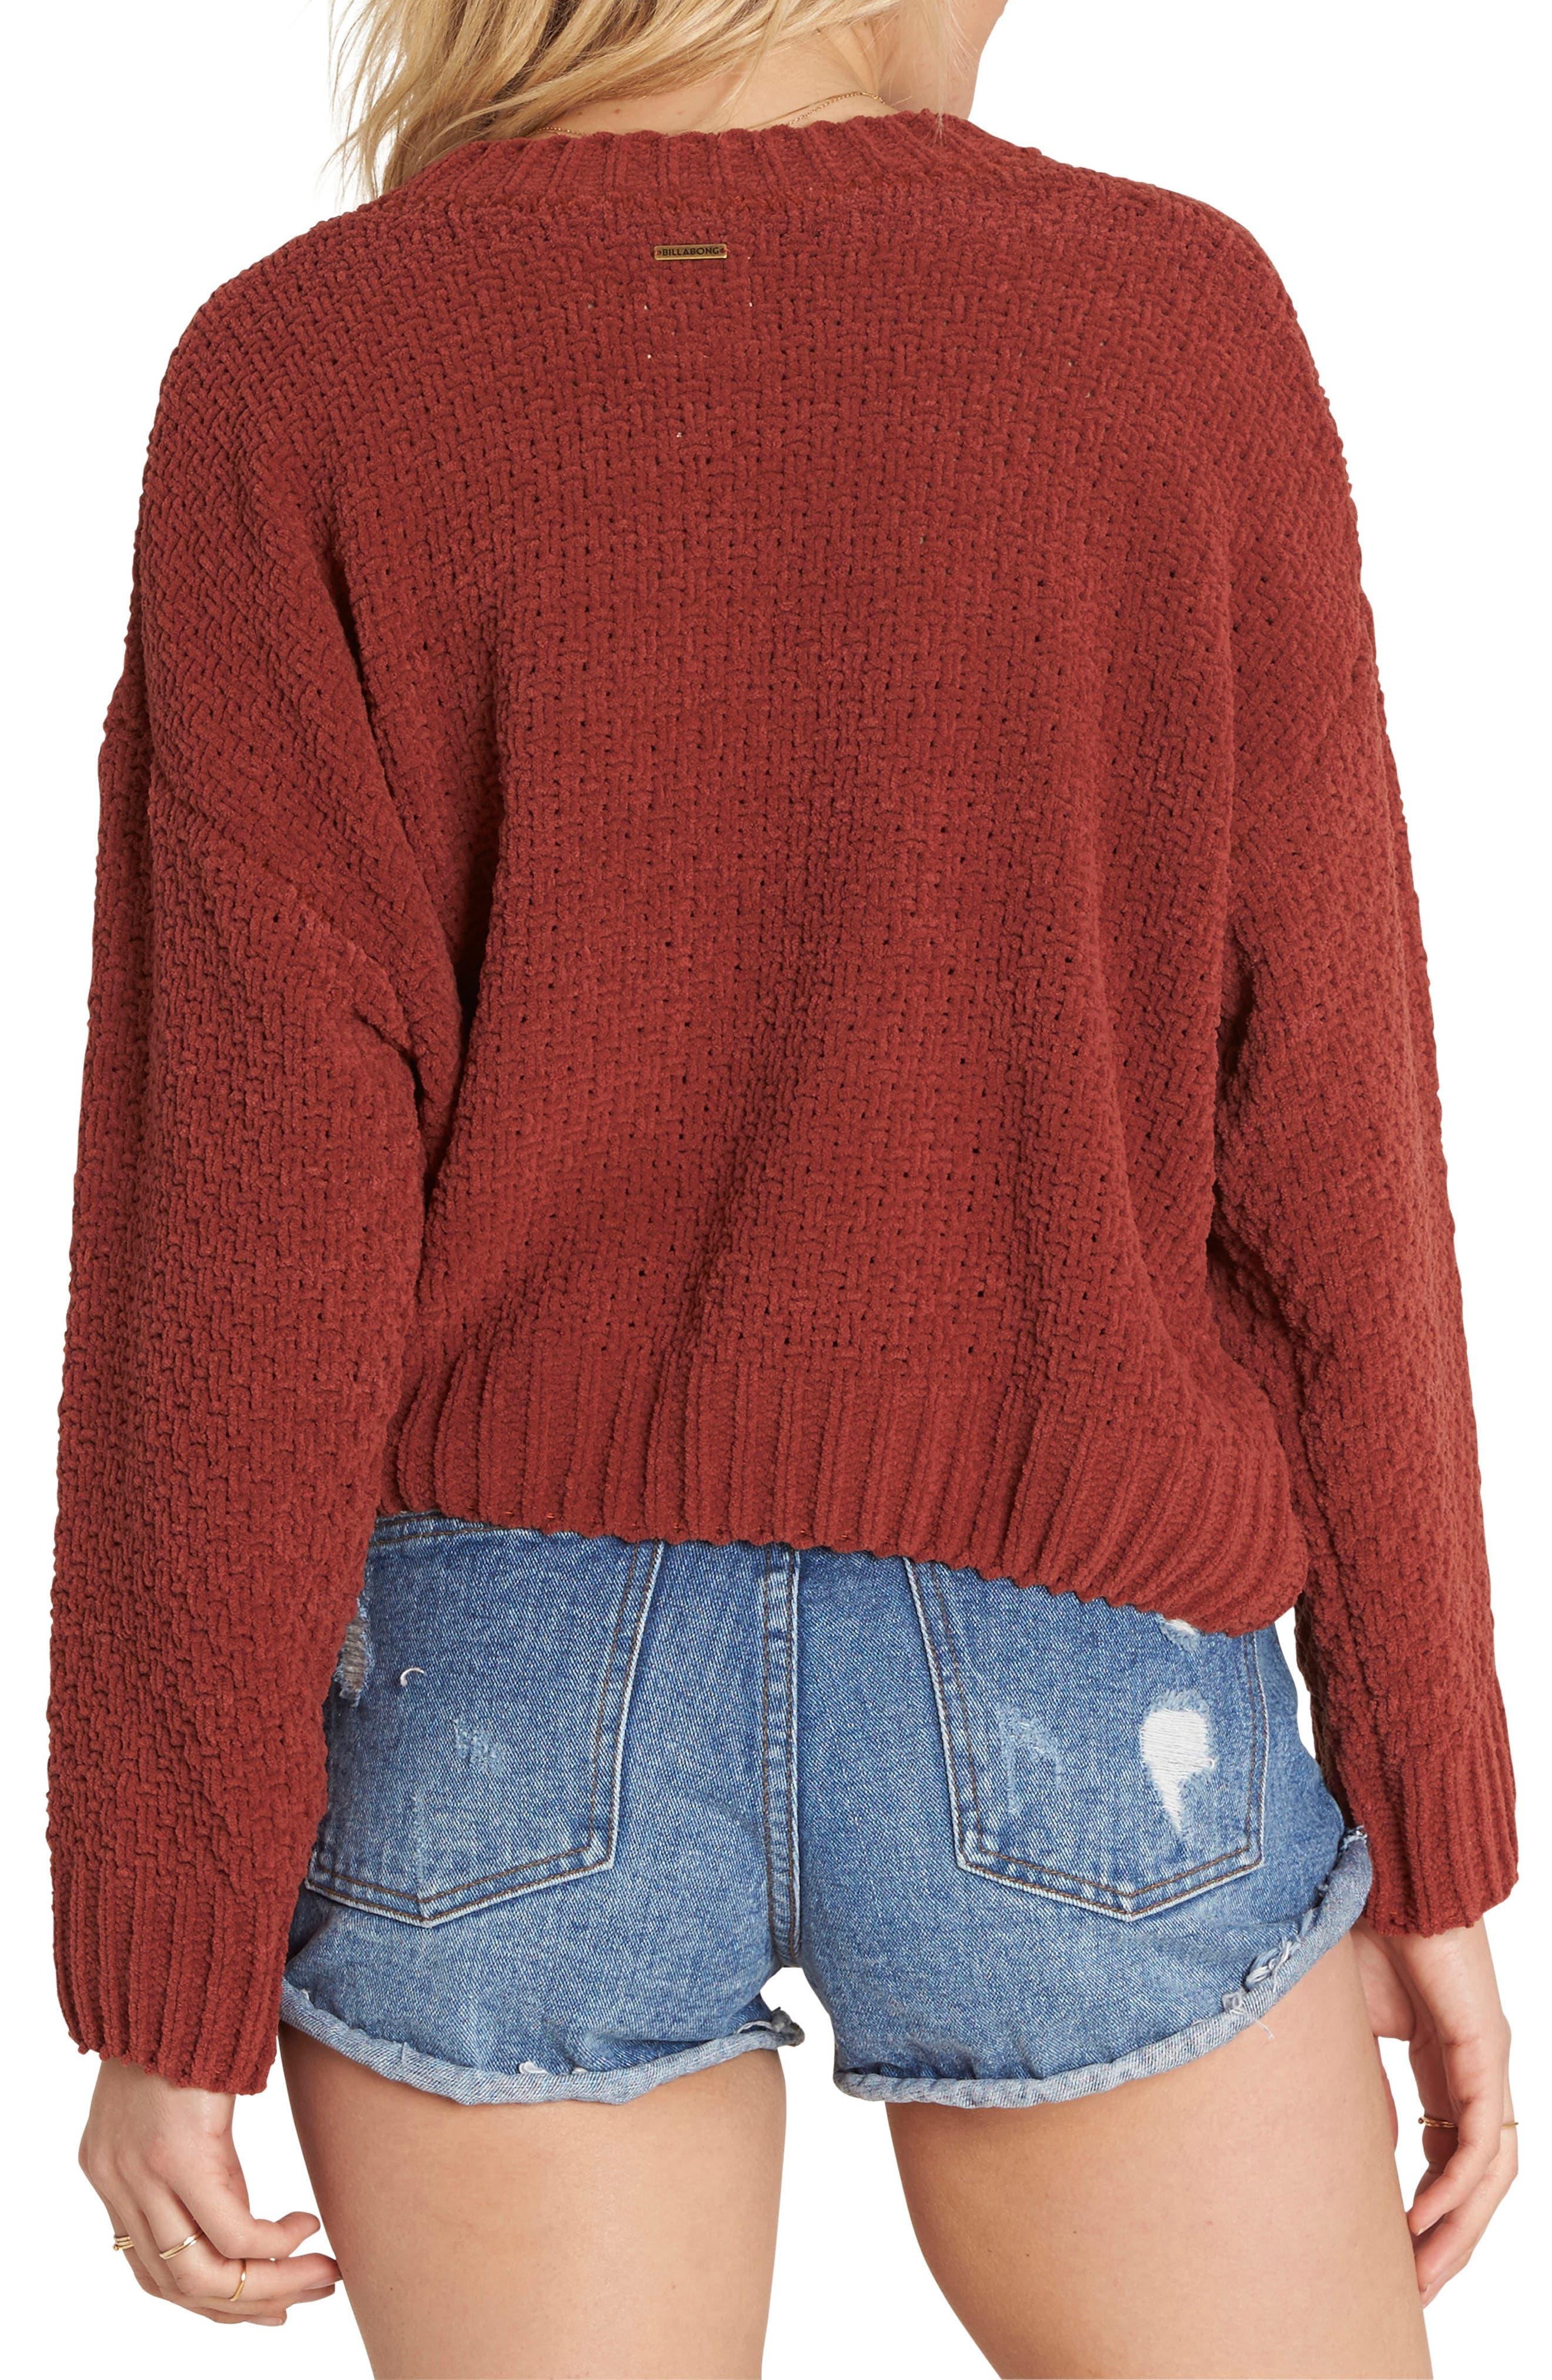 All Mine Chenille Sweater,                             Alternate thumbnail 4, color,